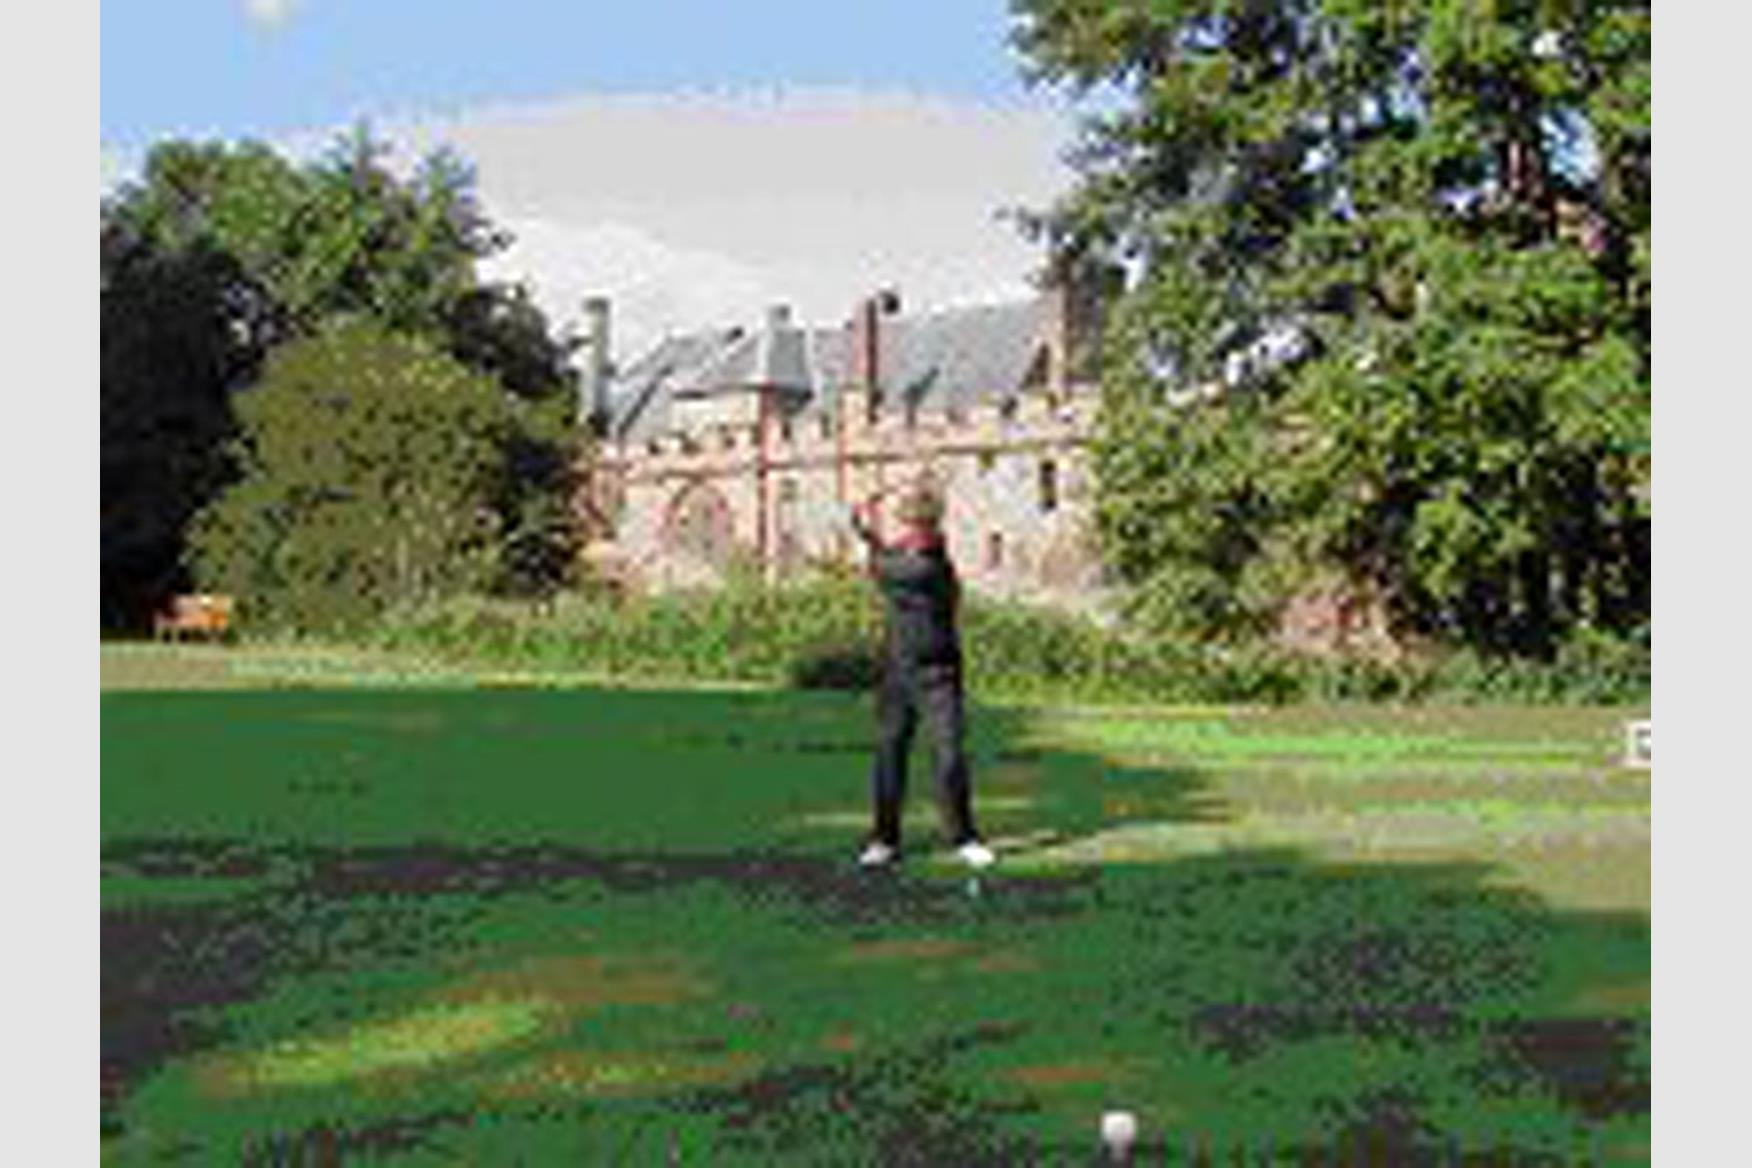 Stonebridge Insurance Complaints 2019 2020 Best Car Designs Pimped Red Jeep Rubicon Maxstoke Park Golf Club Course In Birmingham